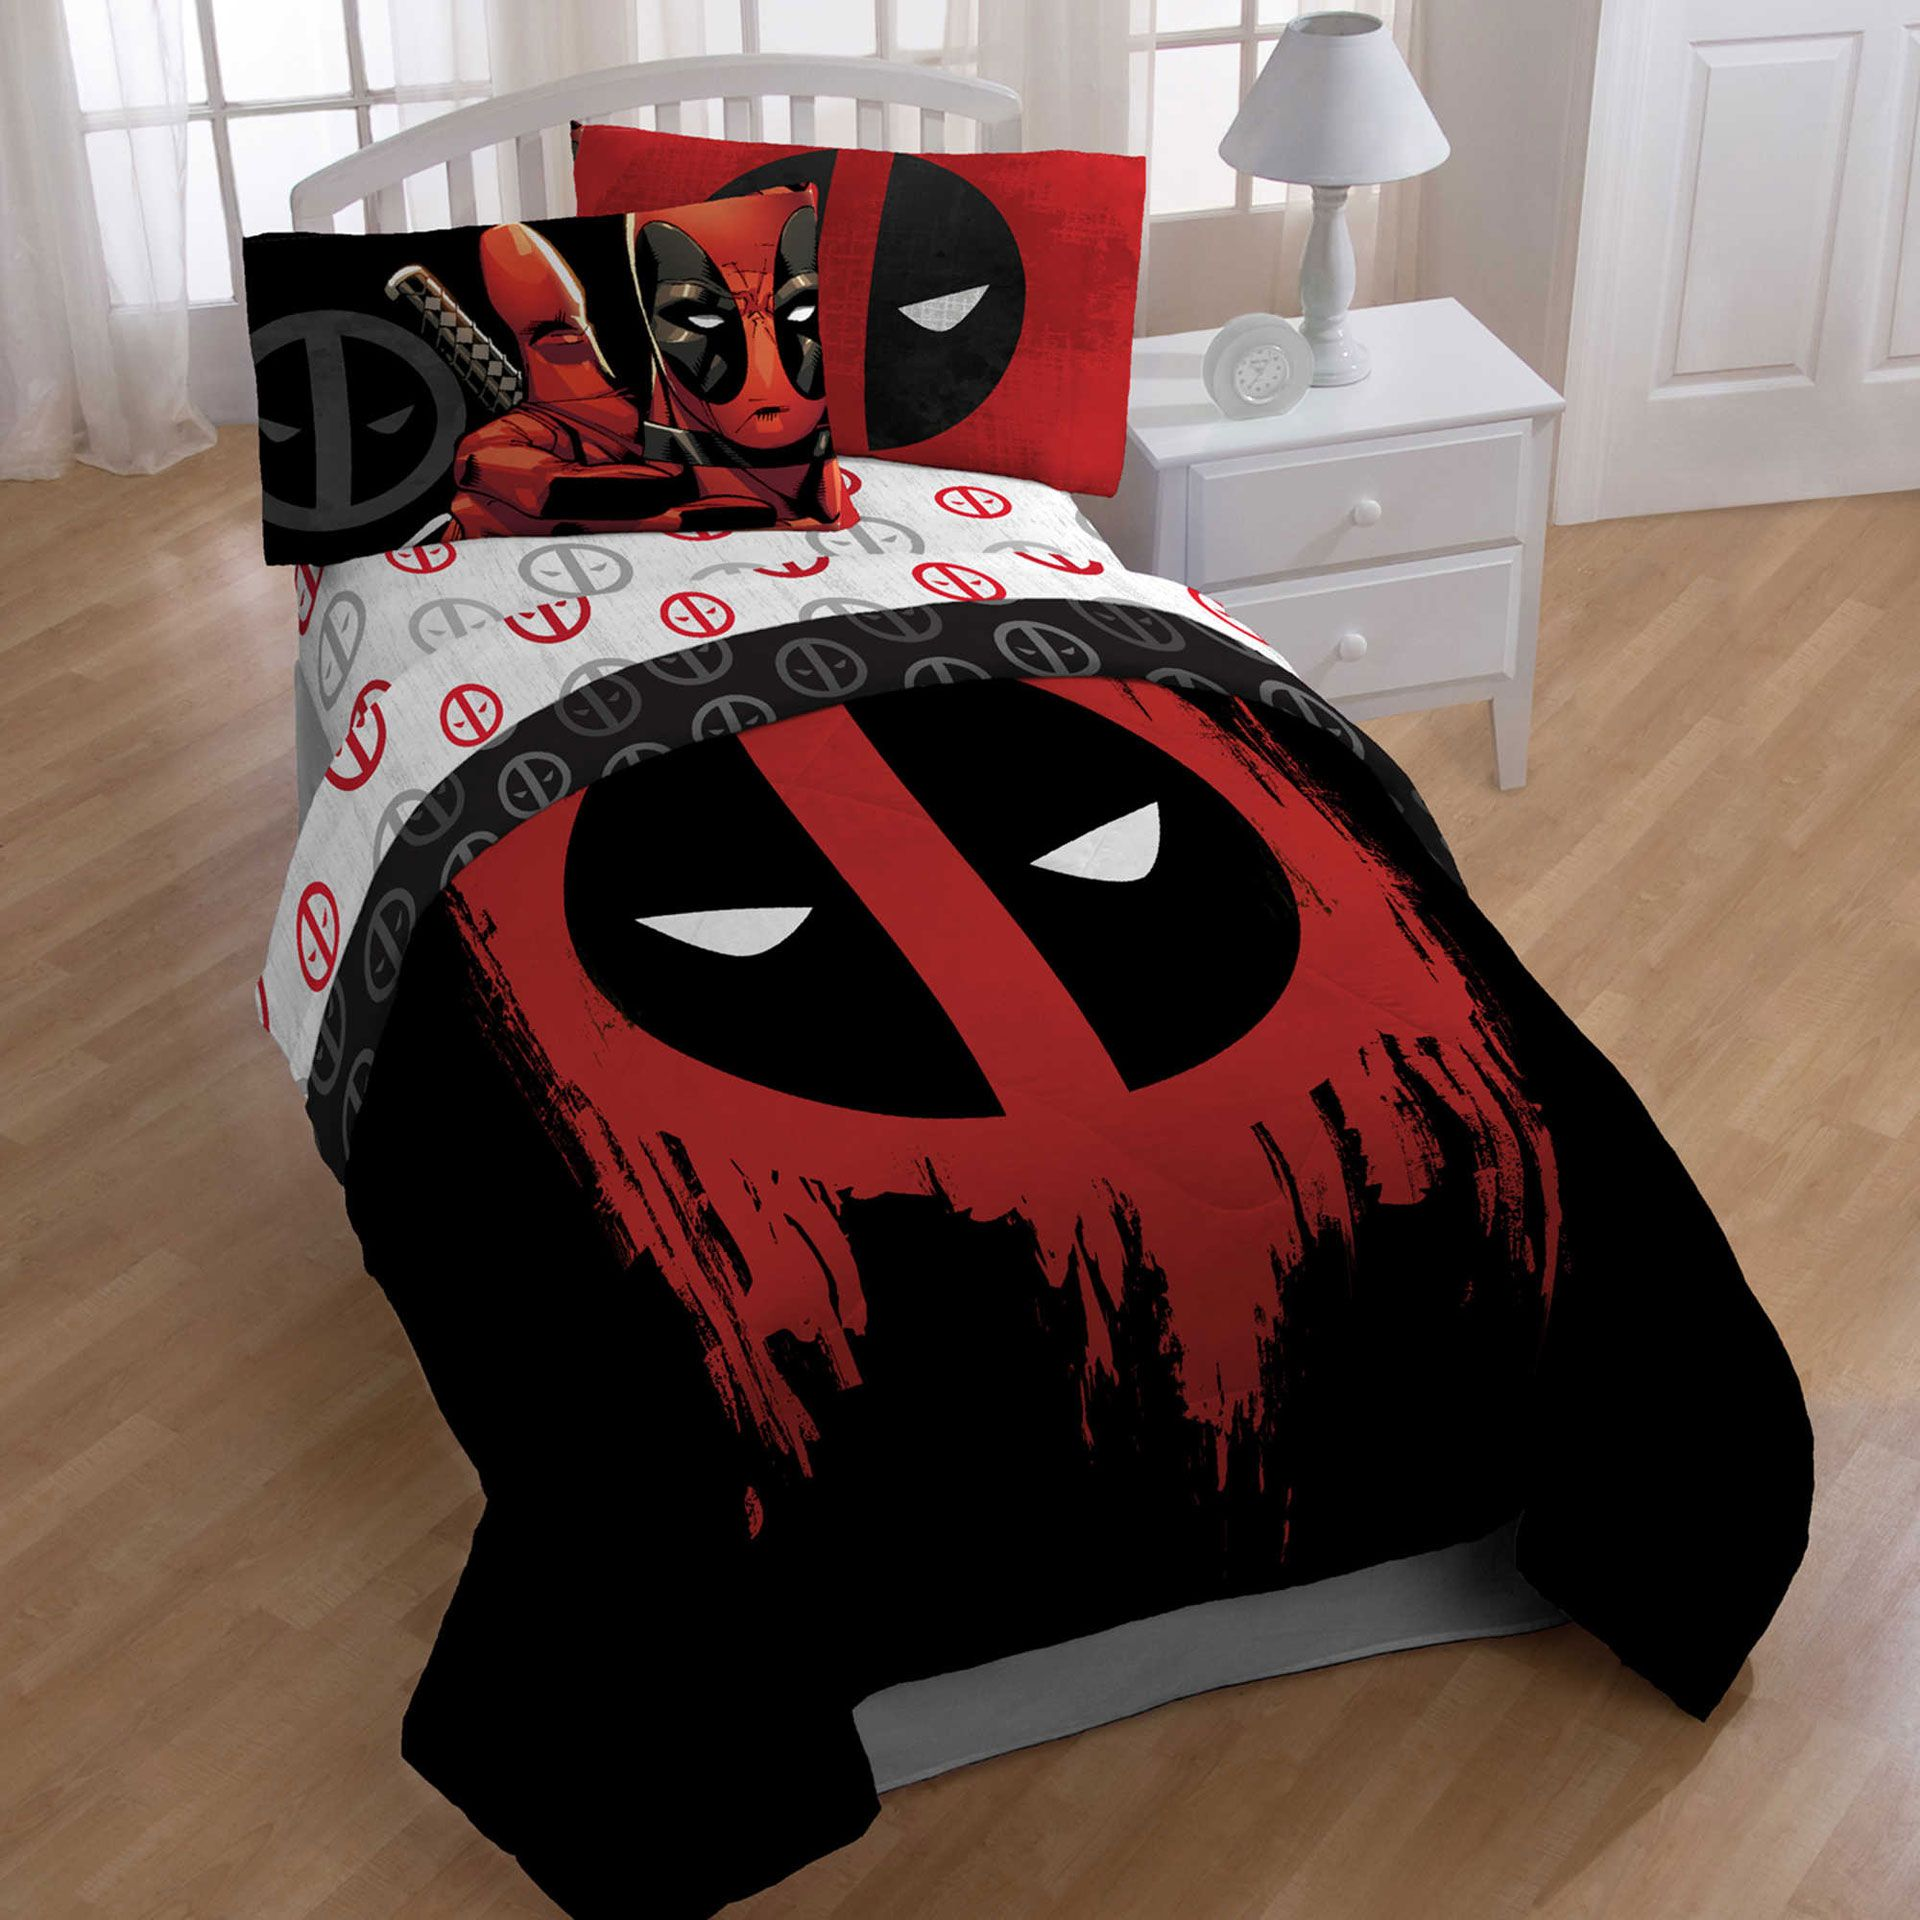 Marvel Deadpool Bedroom Set Decoracao De Casa My New Room E